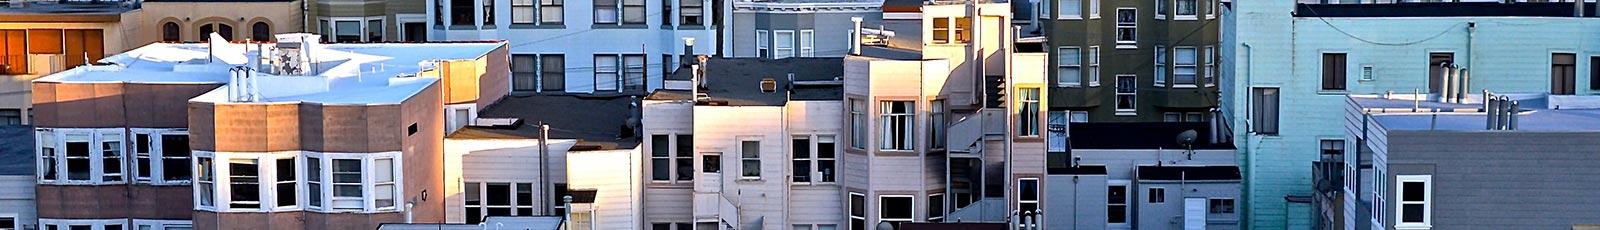 City-Housing-1